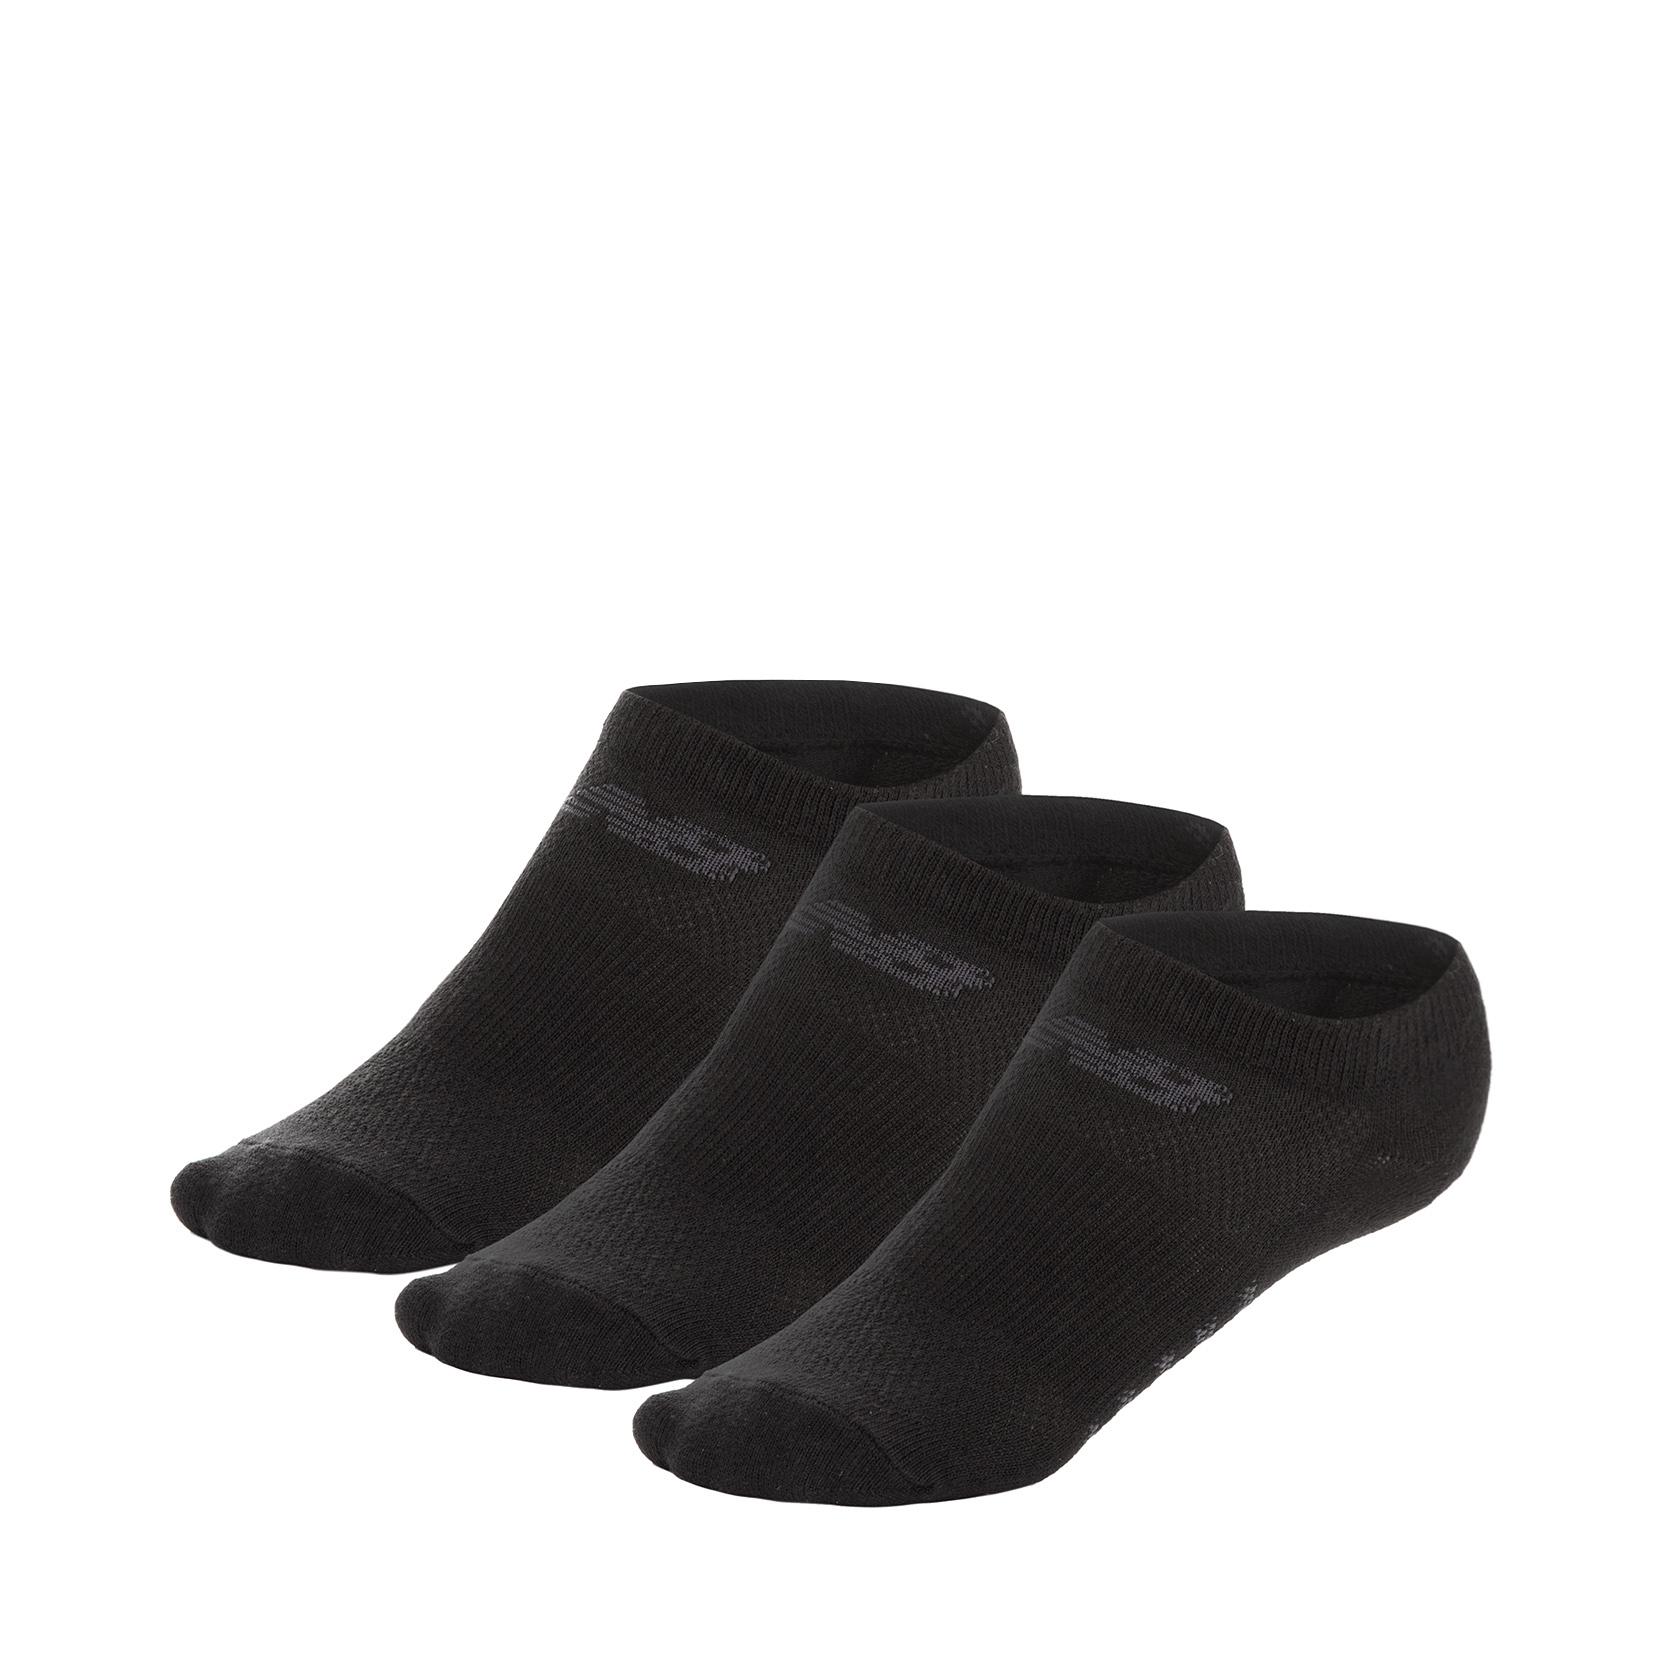 Шкарпетки No Show - Flat Knit (3 пари) N623-3EU_BLK | New Balance